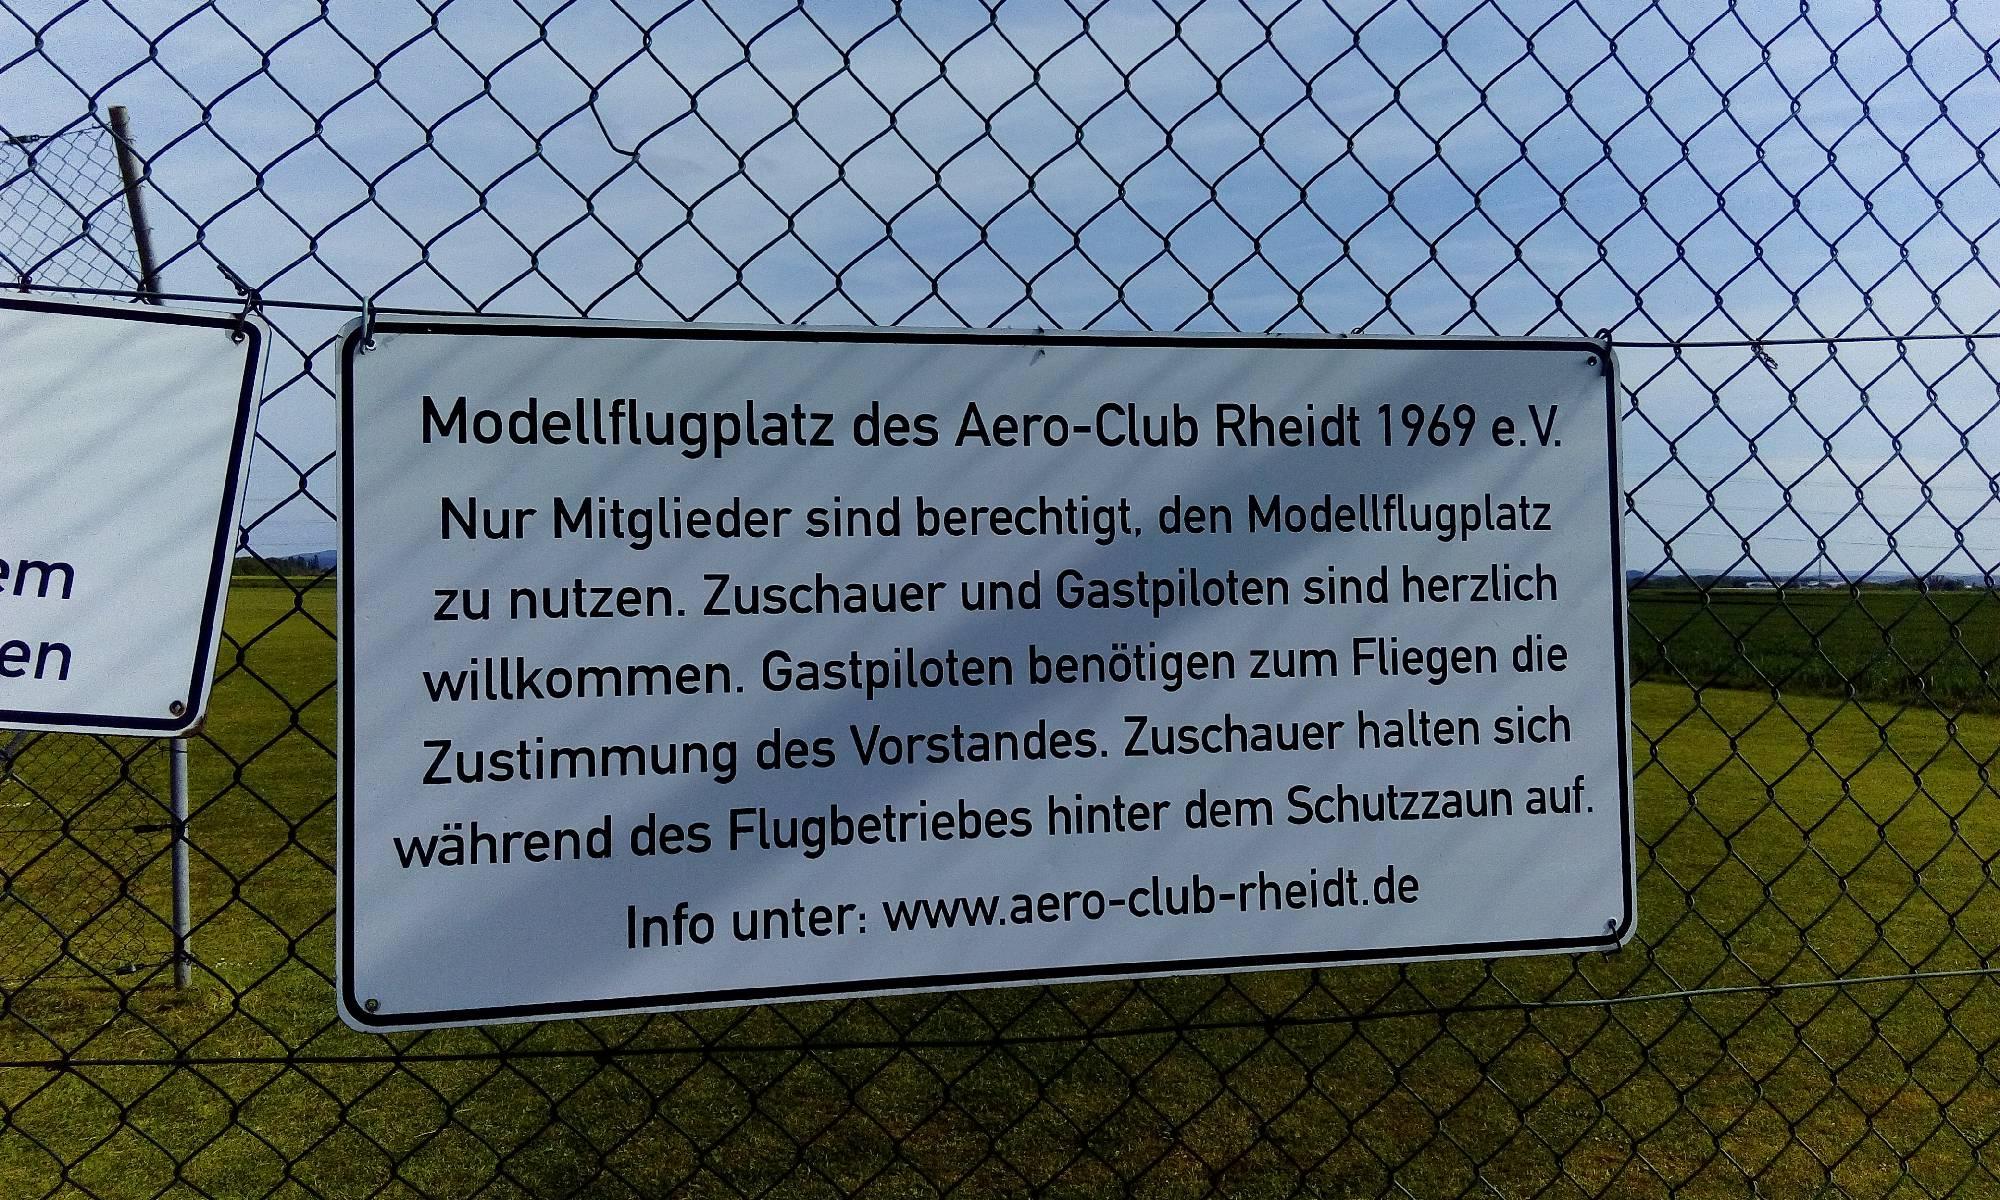 Full Size of Easywall Alu Verbundplatte Alu Verbundplatten Bad Feuerfeste Modellflugschilder Auch Fr Wohnzimmer Easywall Alu Verbundplatte